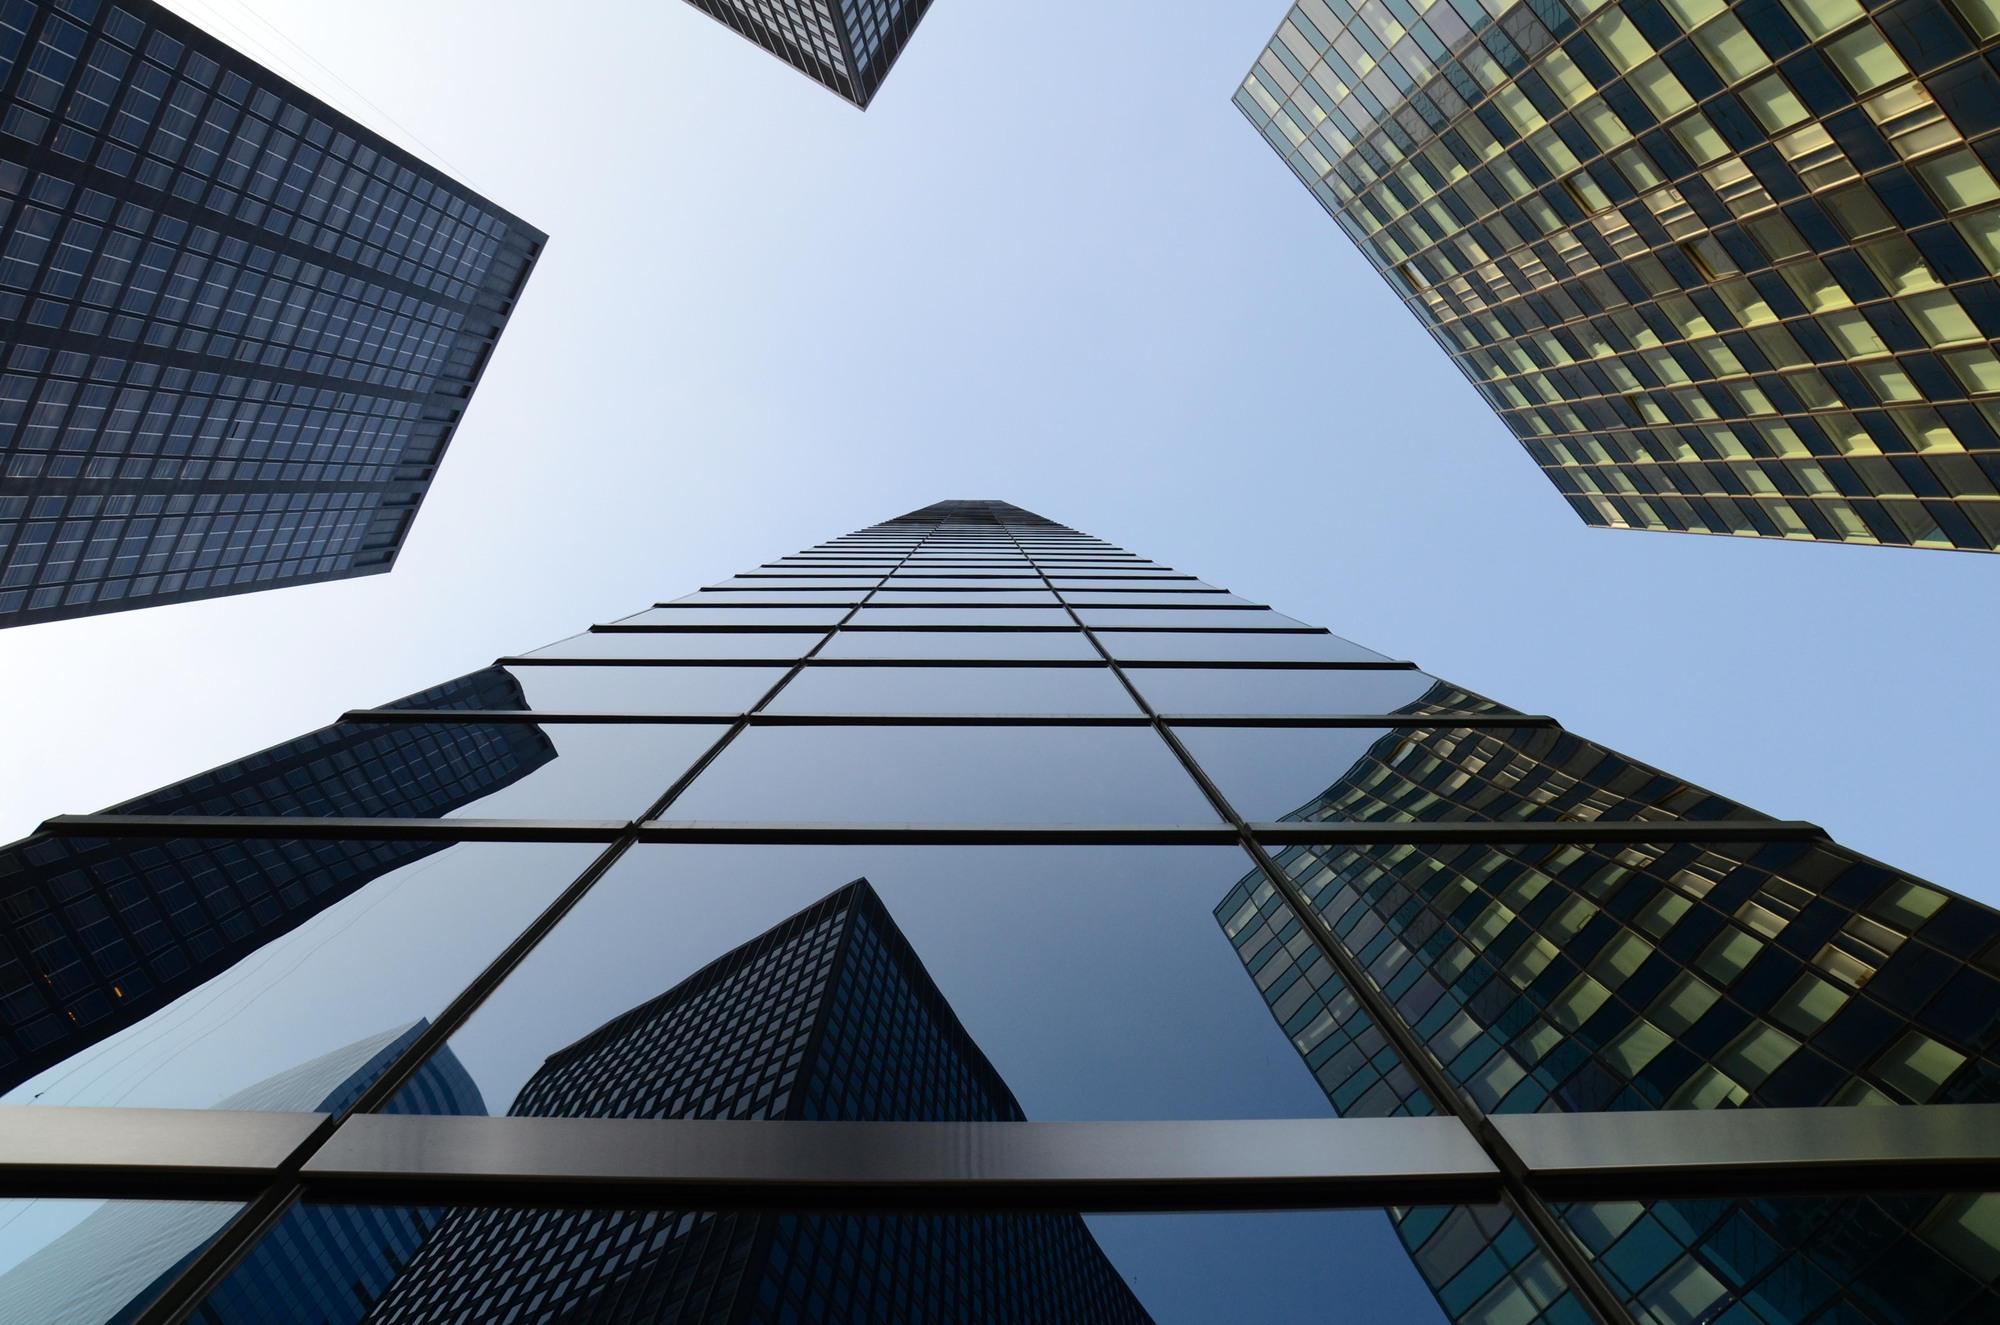 Galer a de fotograf a de arquitectura el cielo protector for Que es diseno en arquitectura